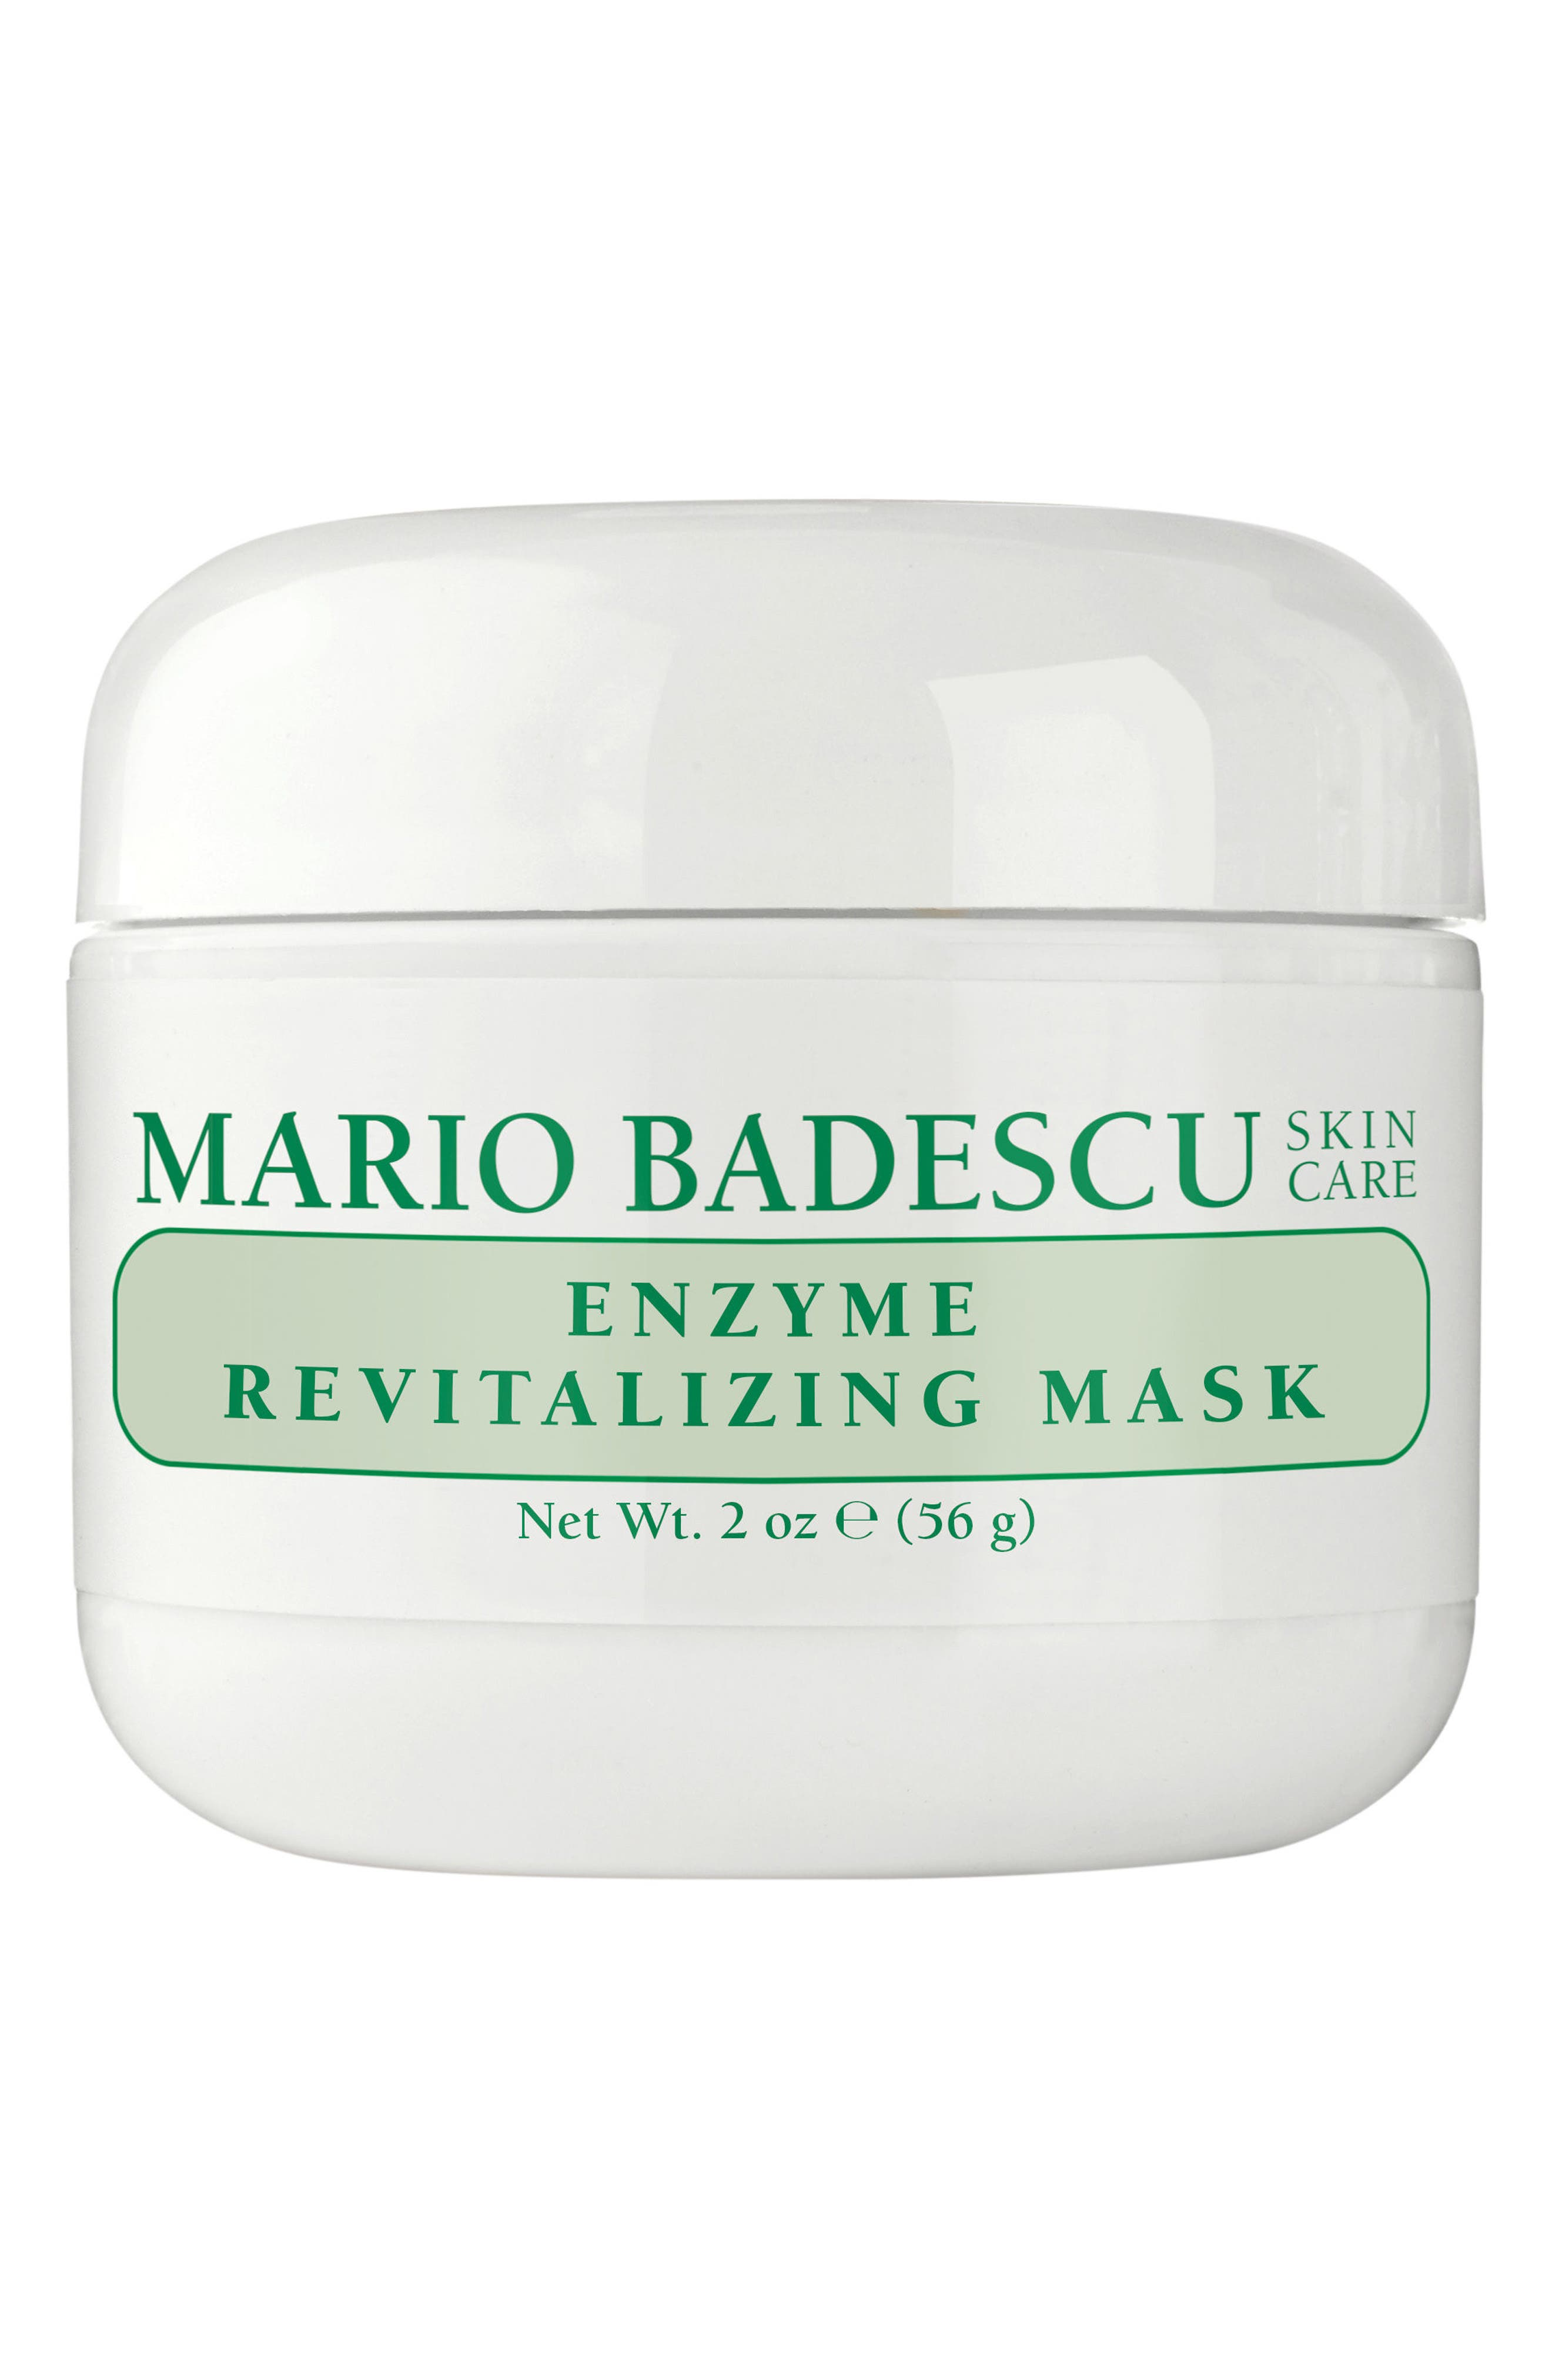 Enzyme Revitalizing Mask,                             Main thumbnail 1, color,                             No Color